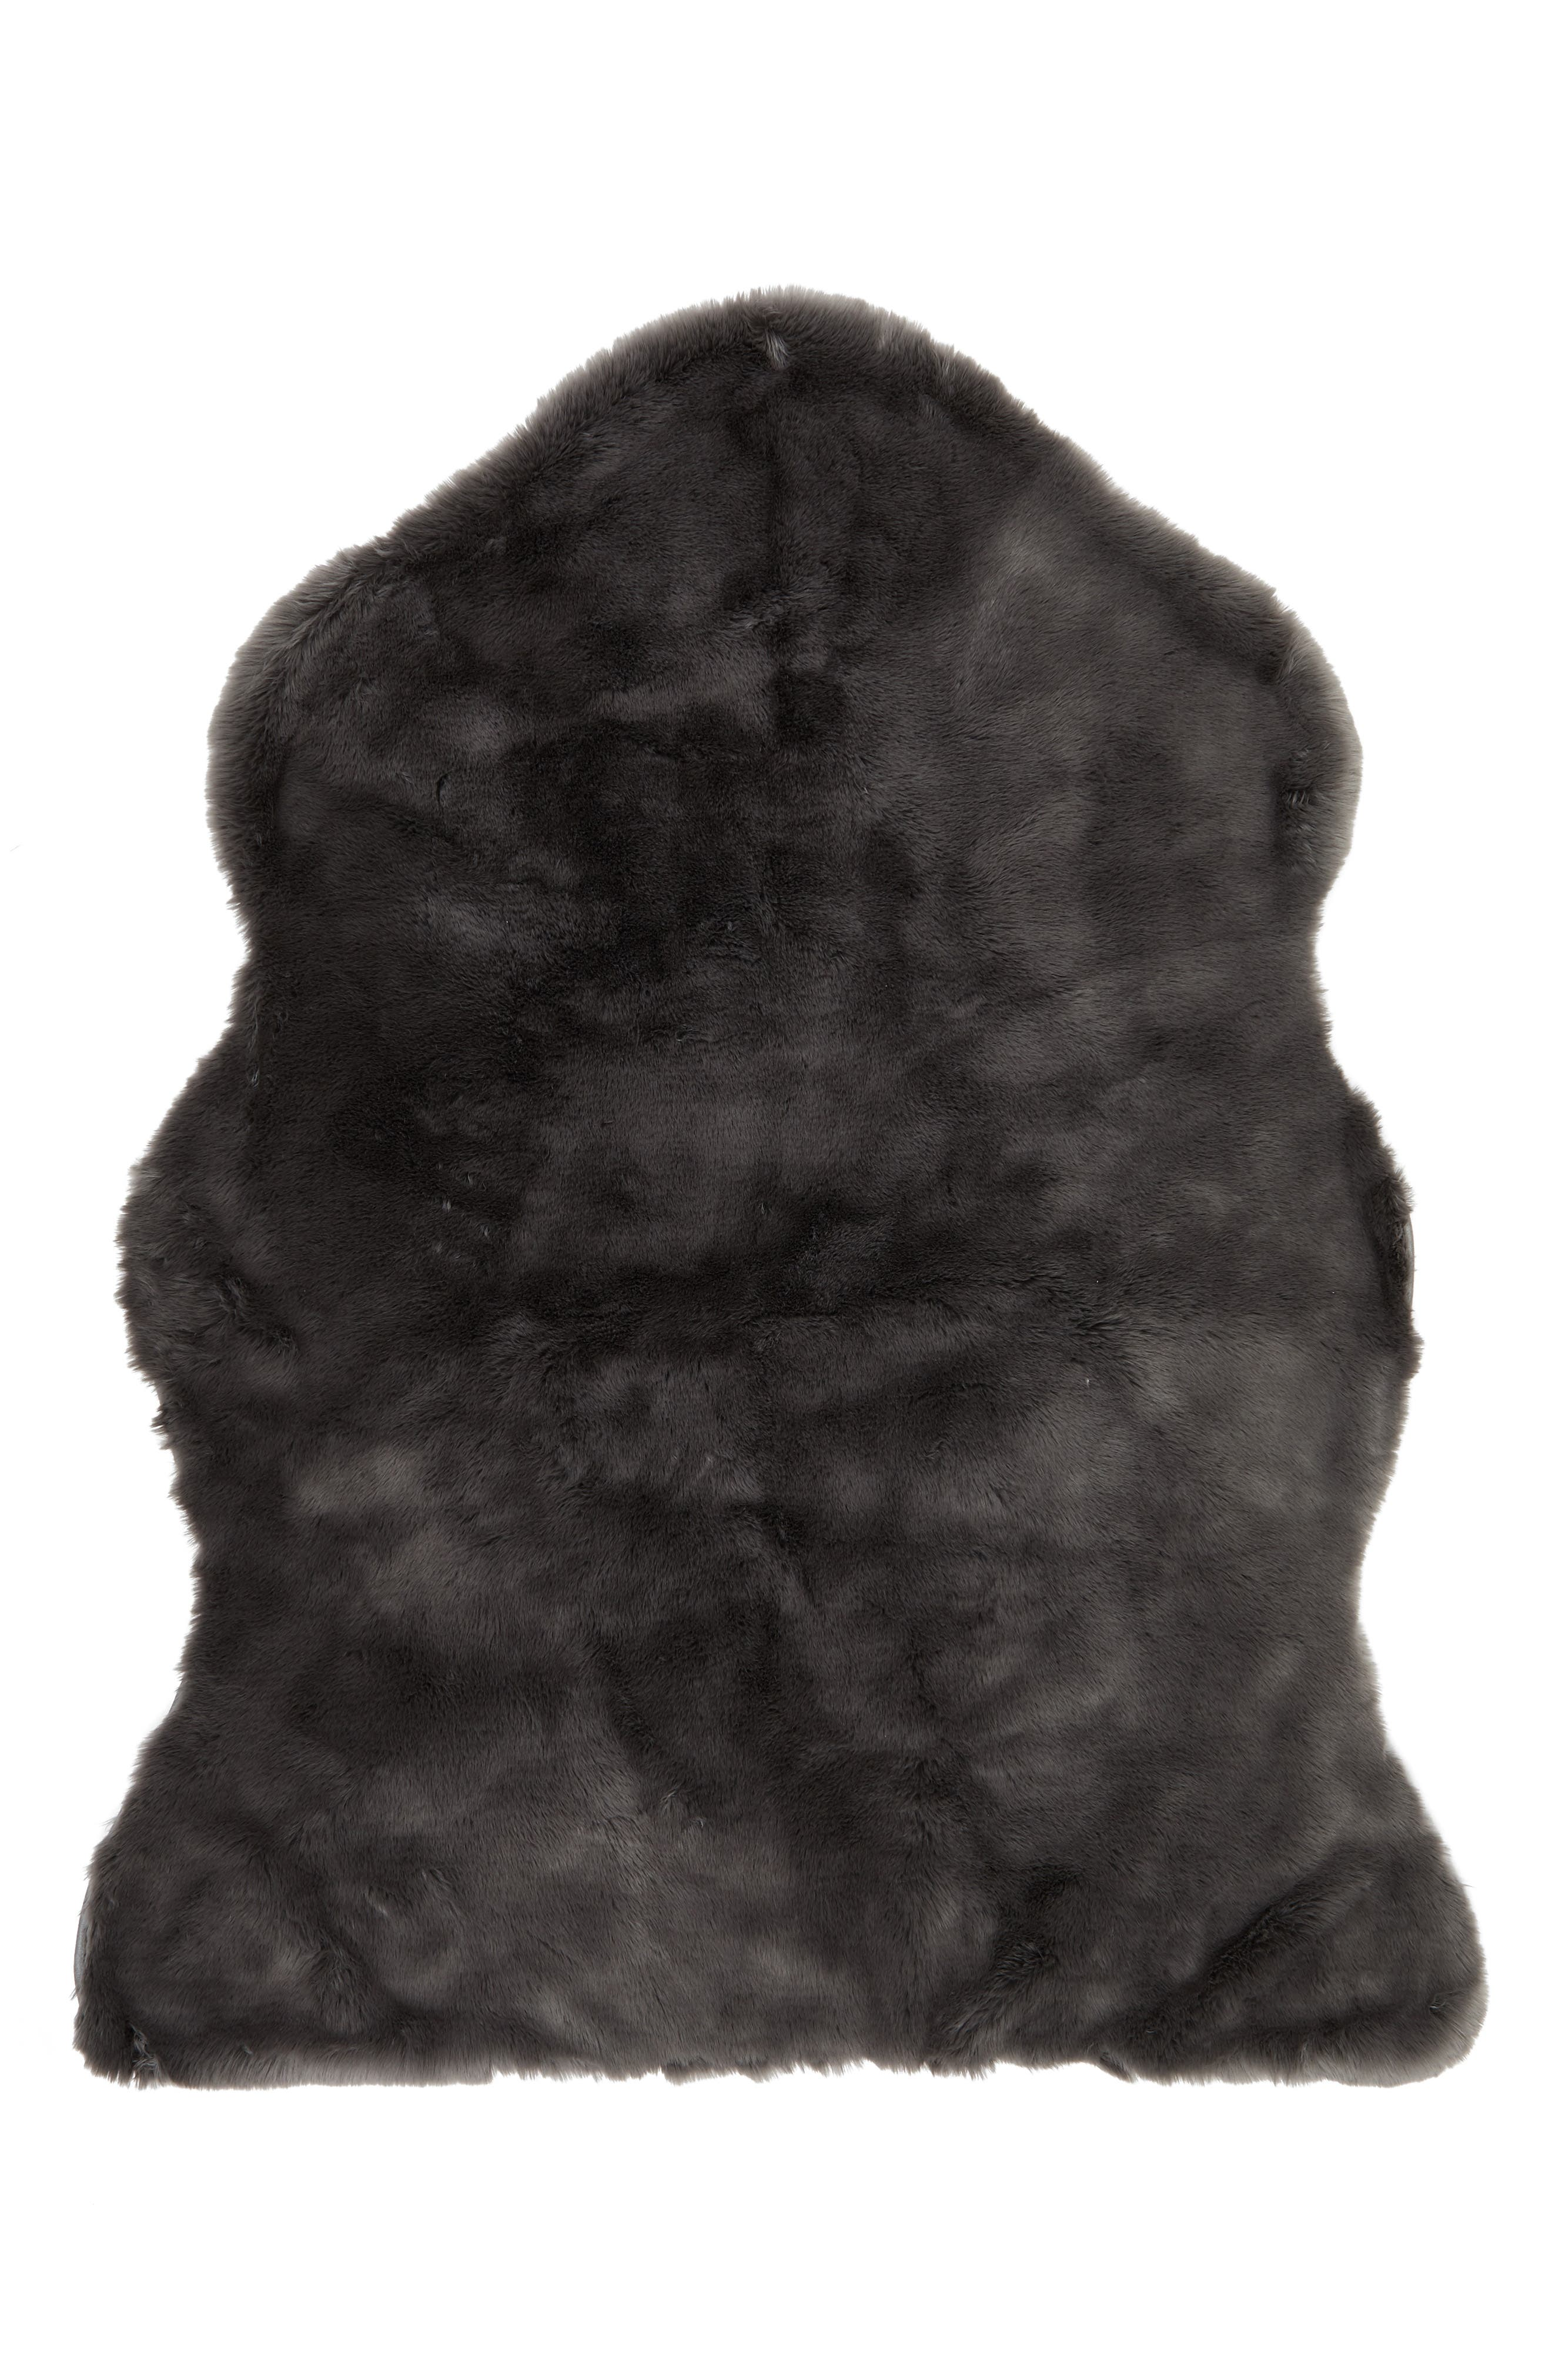 Cuddle Up Faux Fur Shaped Rug,                             Main thumbnail 1, color,                             GREY ASPHALT